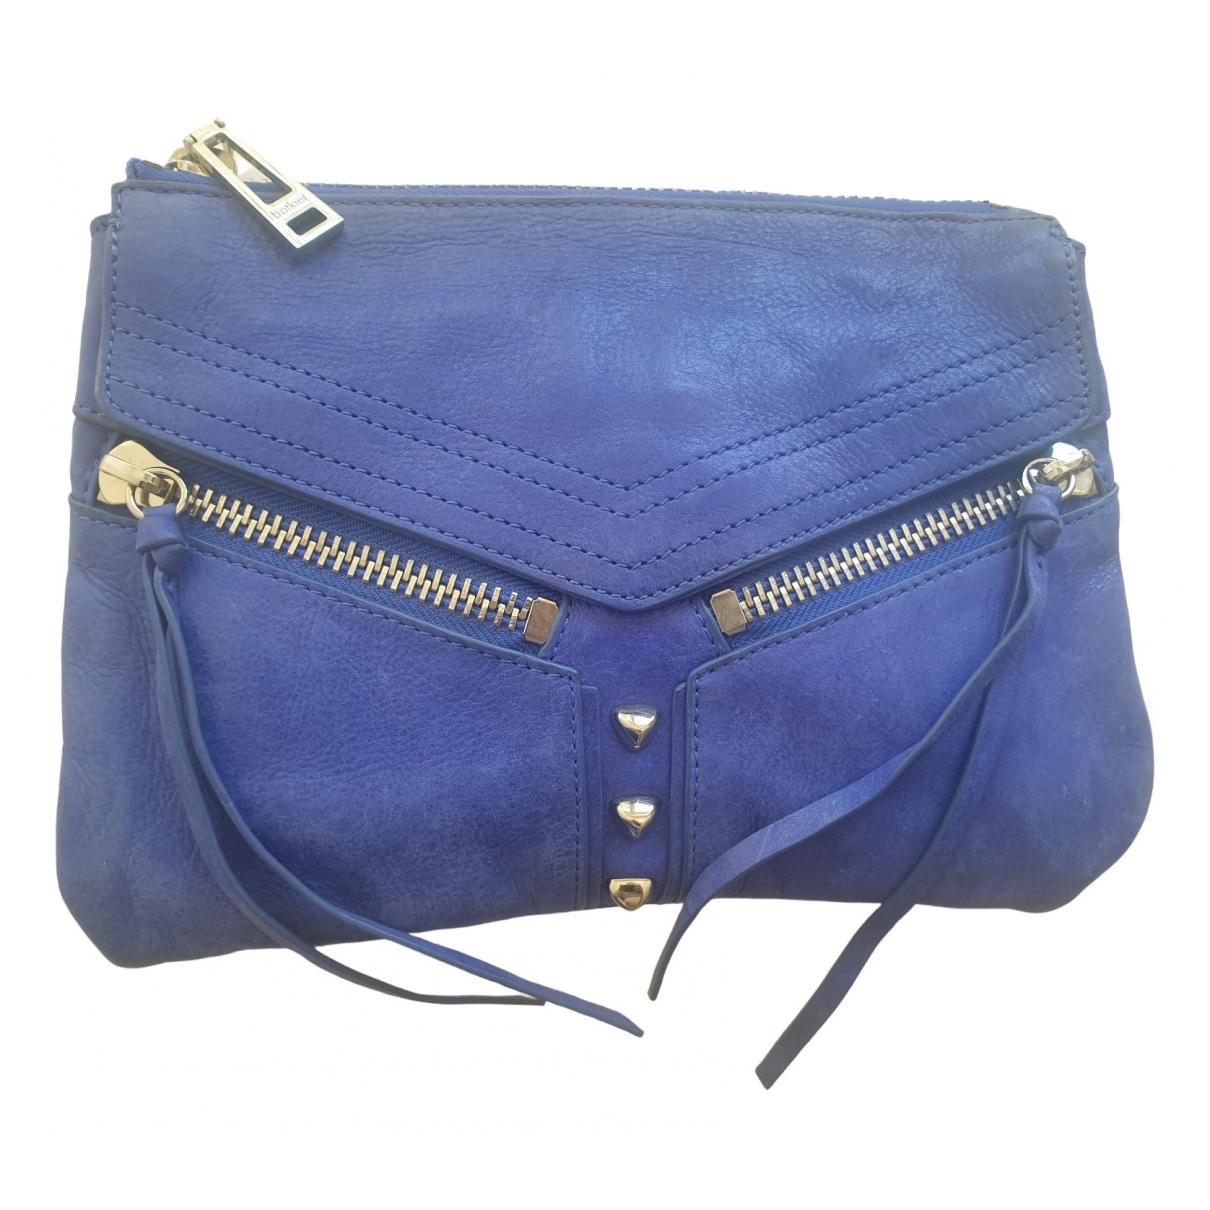 Botkier \N Blue Leather Clutch bag for Women \N